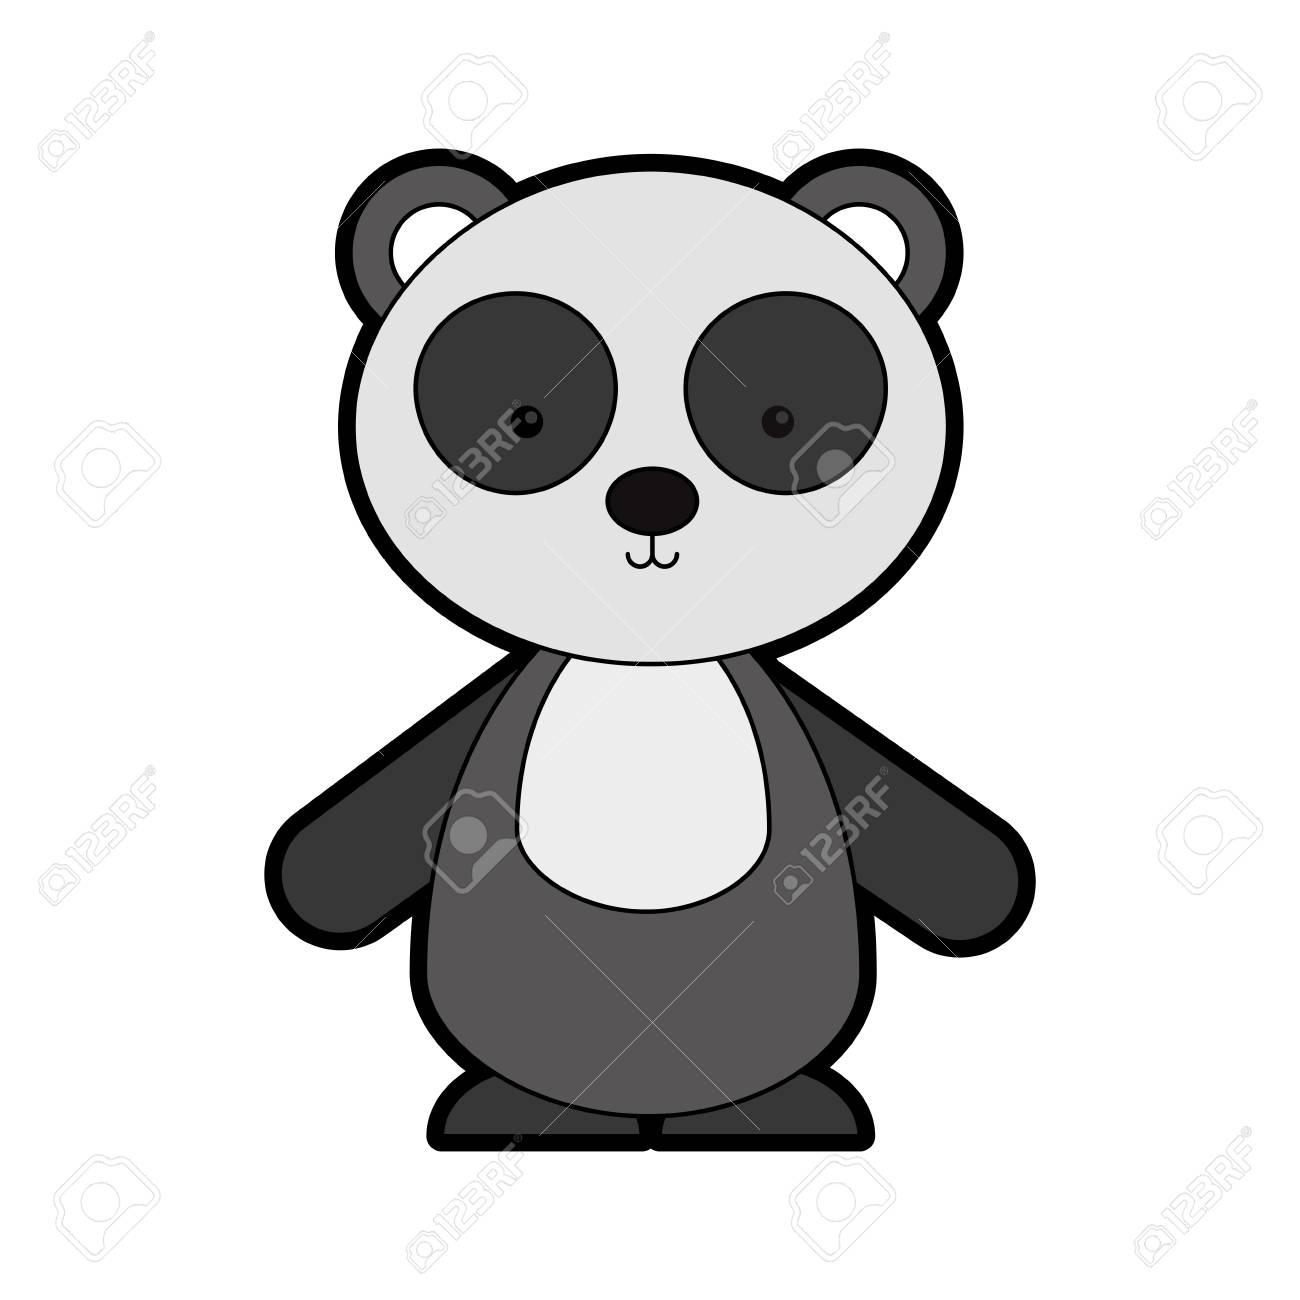 Animaux Panda Dessin Animé Icône Vector Illustration Design Graphique